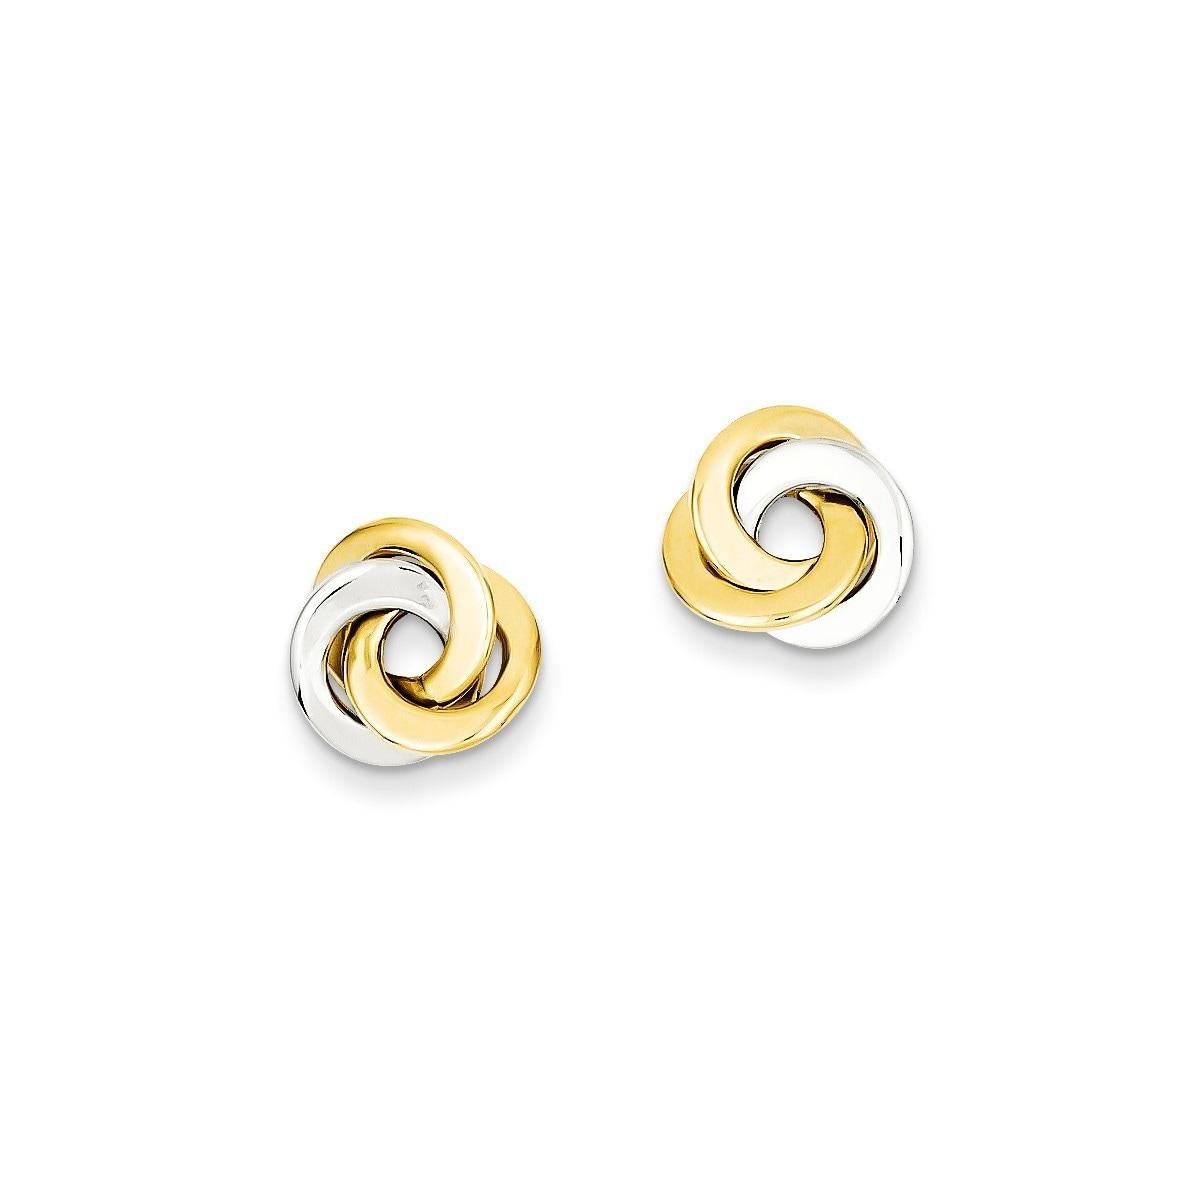 5mm Ladies 14K Yellow Gold Love Knot Post Push Back Stud Earrings